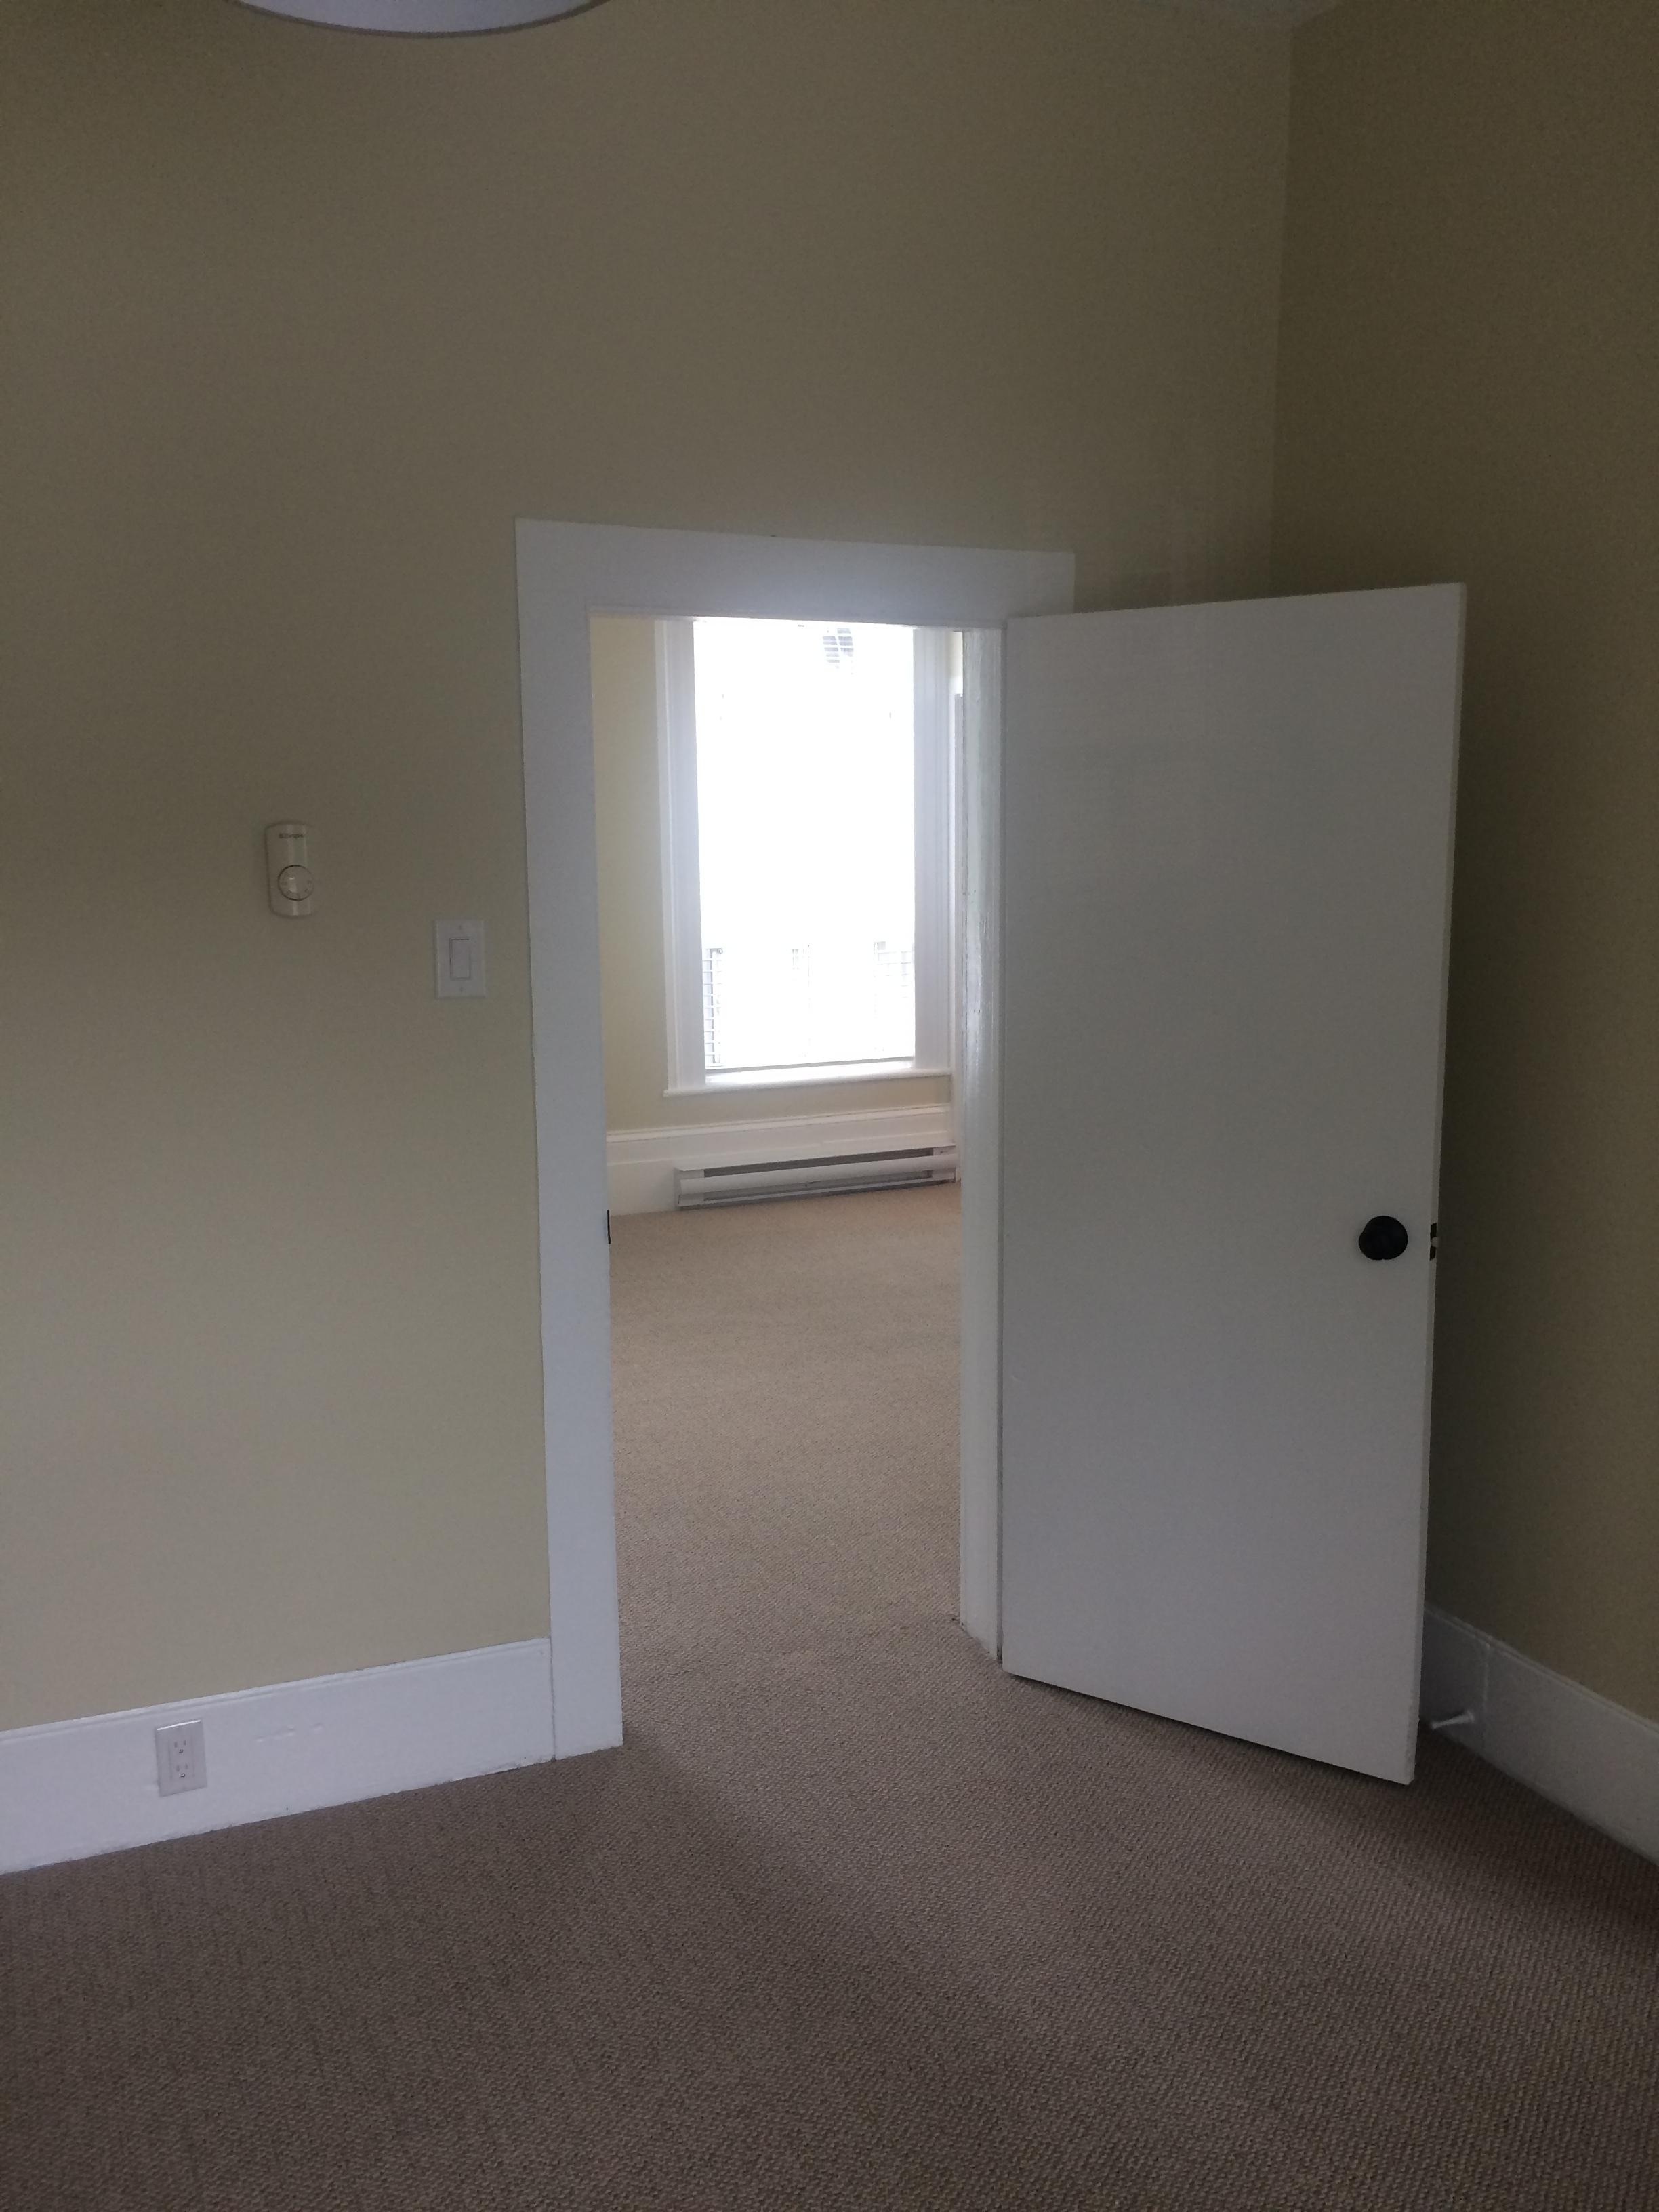 Bedroom to Living Room View.jpg